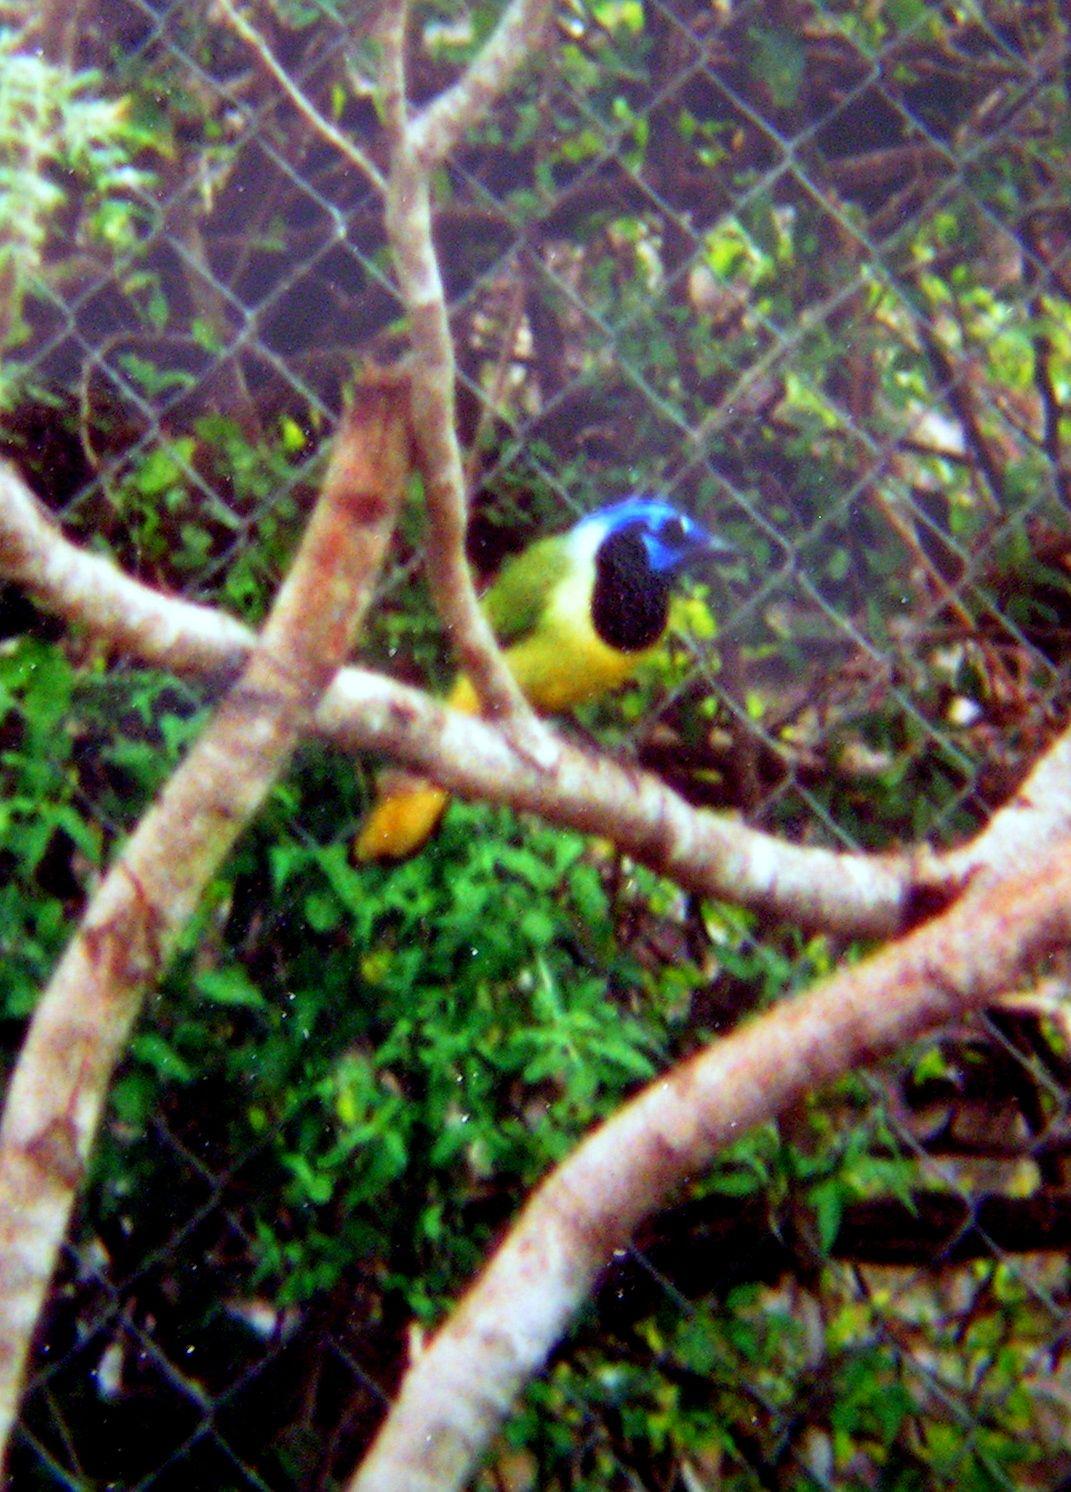 #Green Jay.  Feb 19, 1994                         *Laguna Atascosa NWR, TX w/ Jan Photo TRD - 591. Green Jay. Bentsen-Rio Grande St Pk, feb 19, 1994.